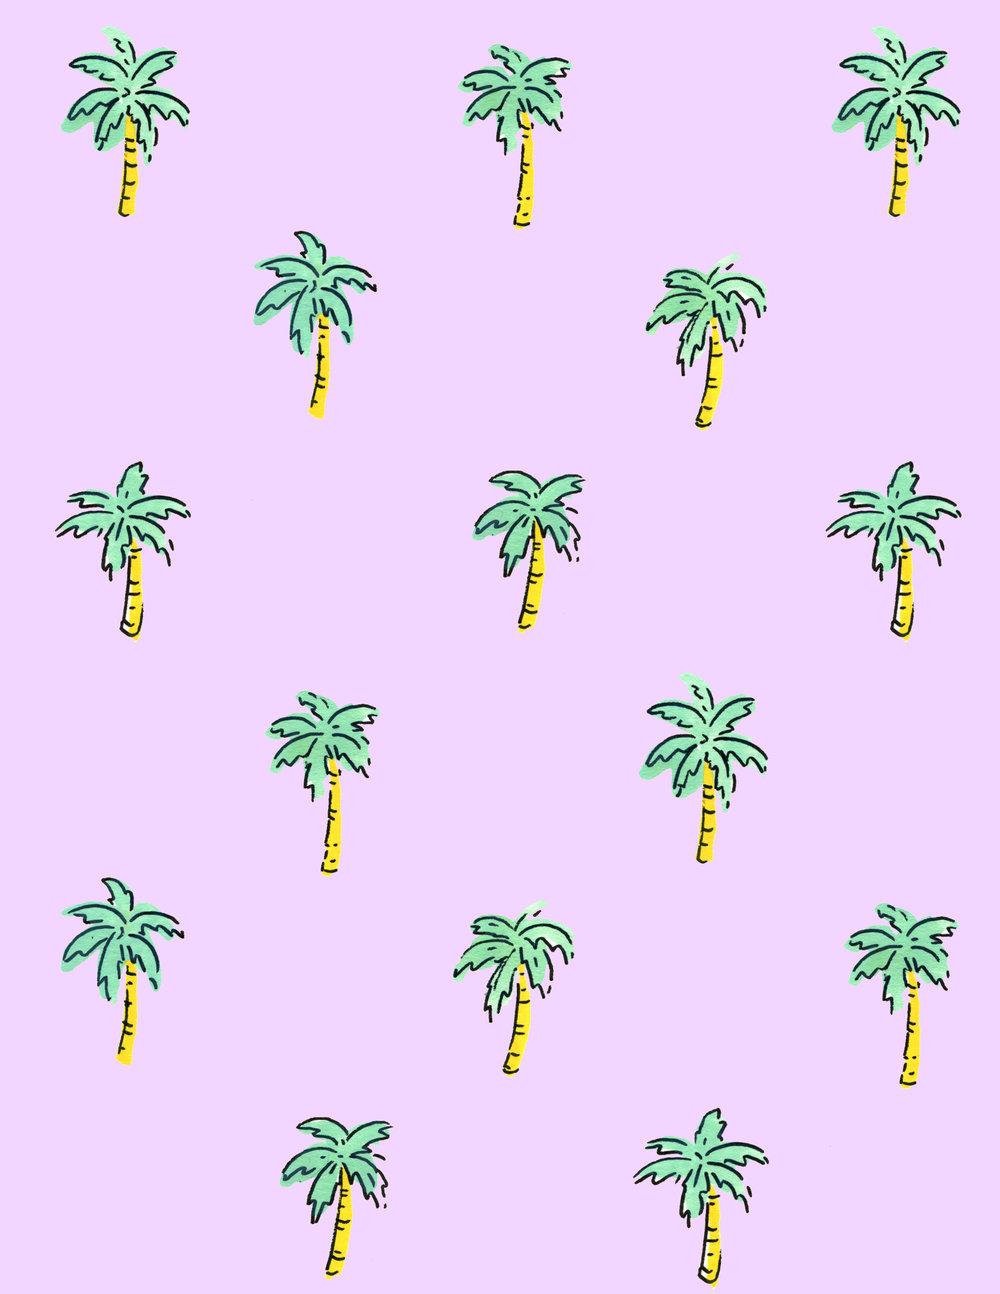 Cellrare-palms.jpg